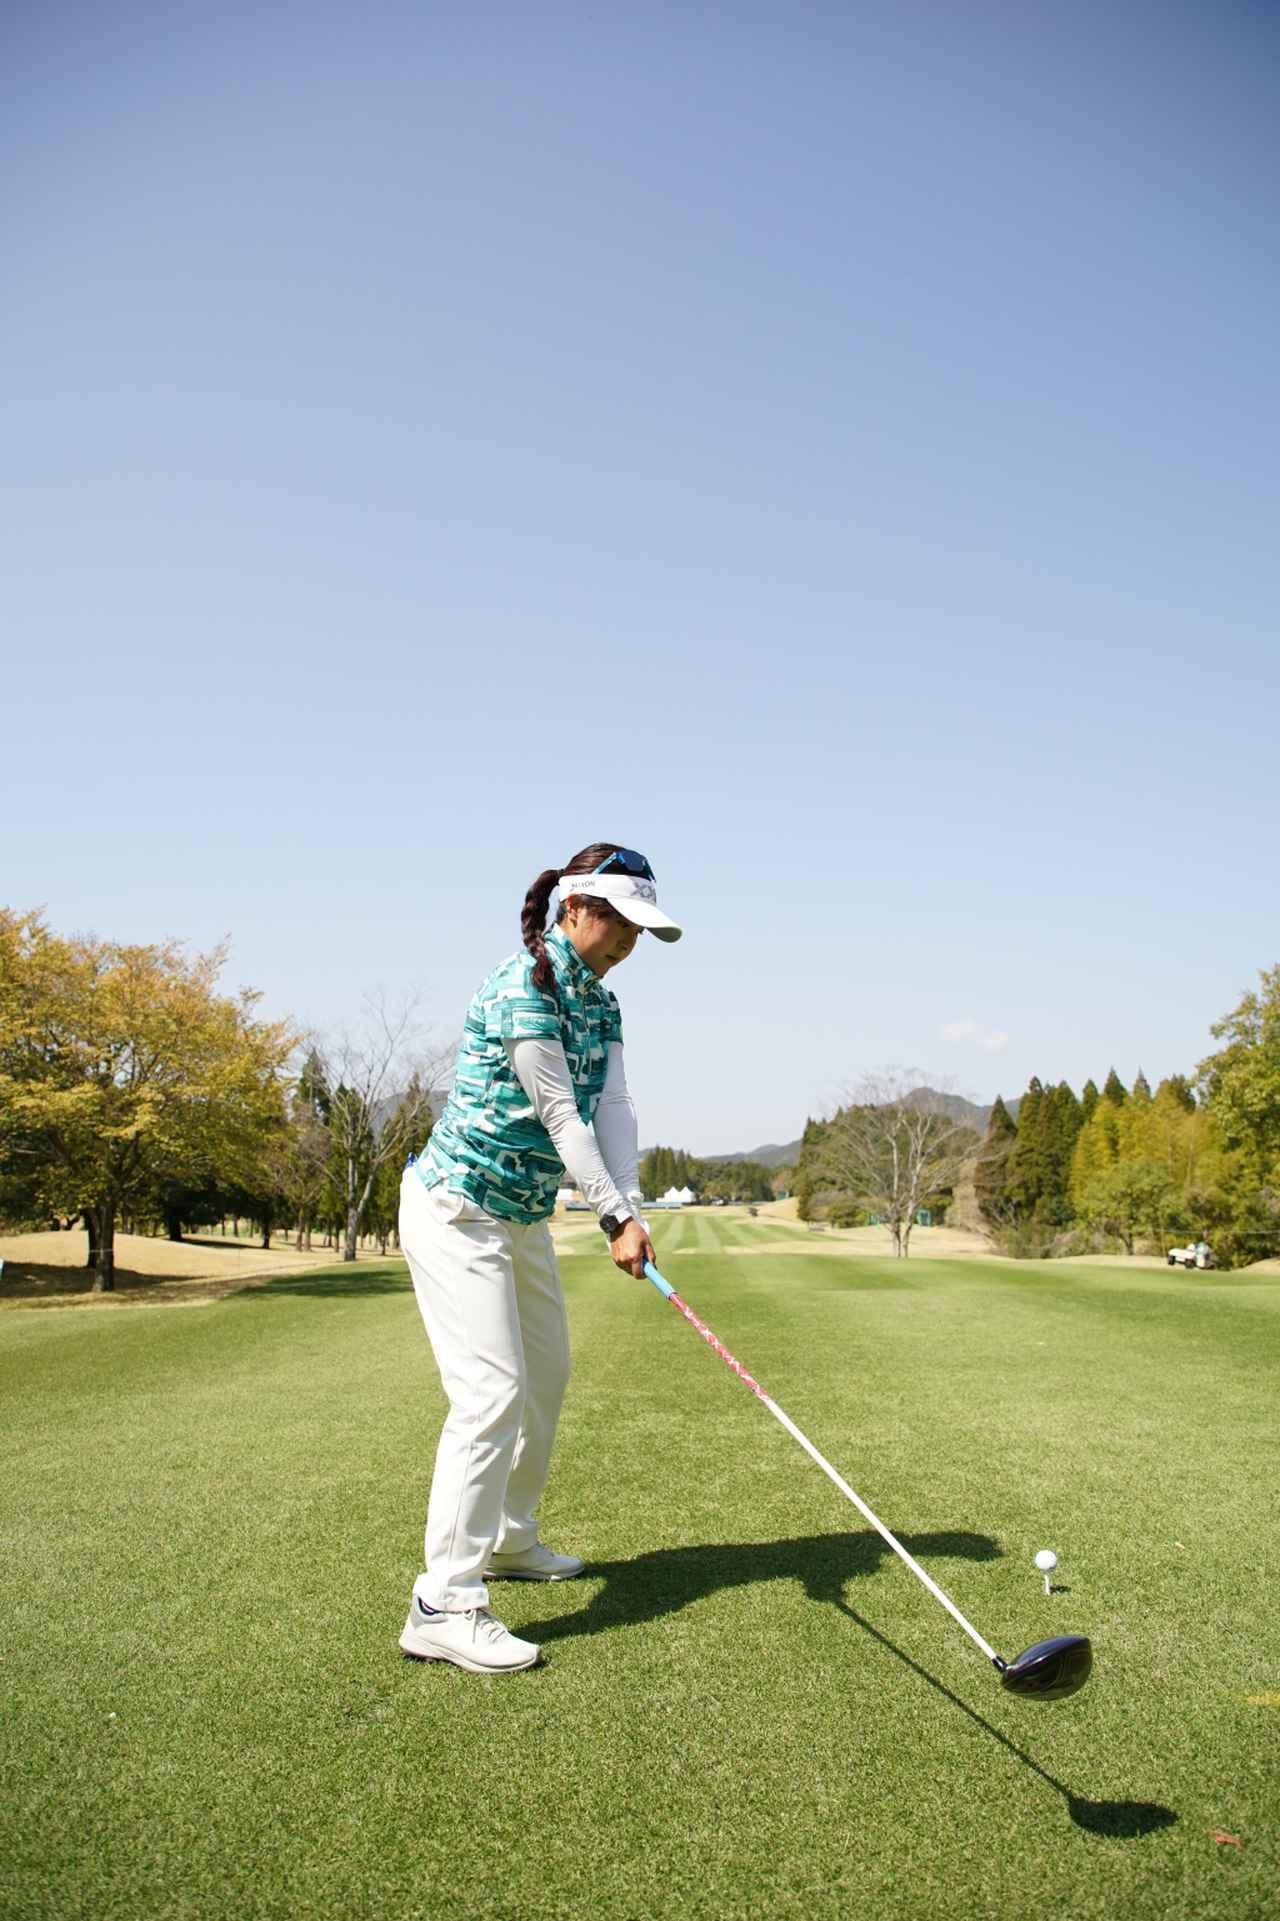 Images : 3番目の画像 - 青木瀬令奈のドライバー連続写真(後方) - みんなのゴルフダイジェスト